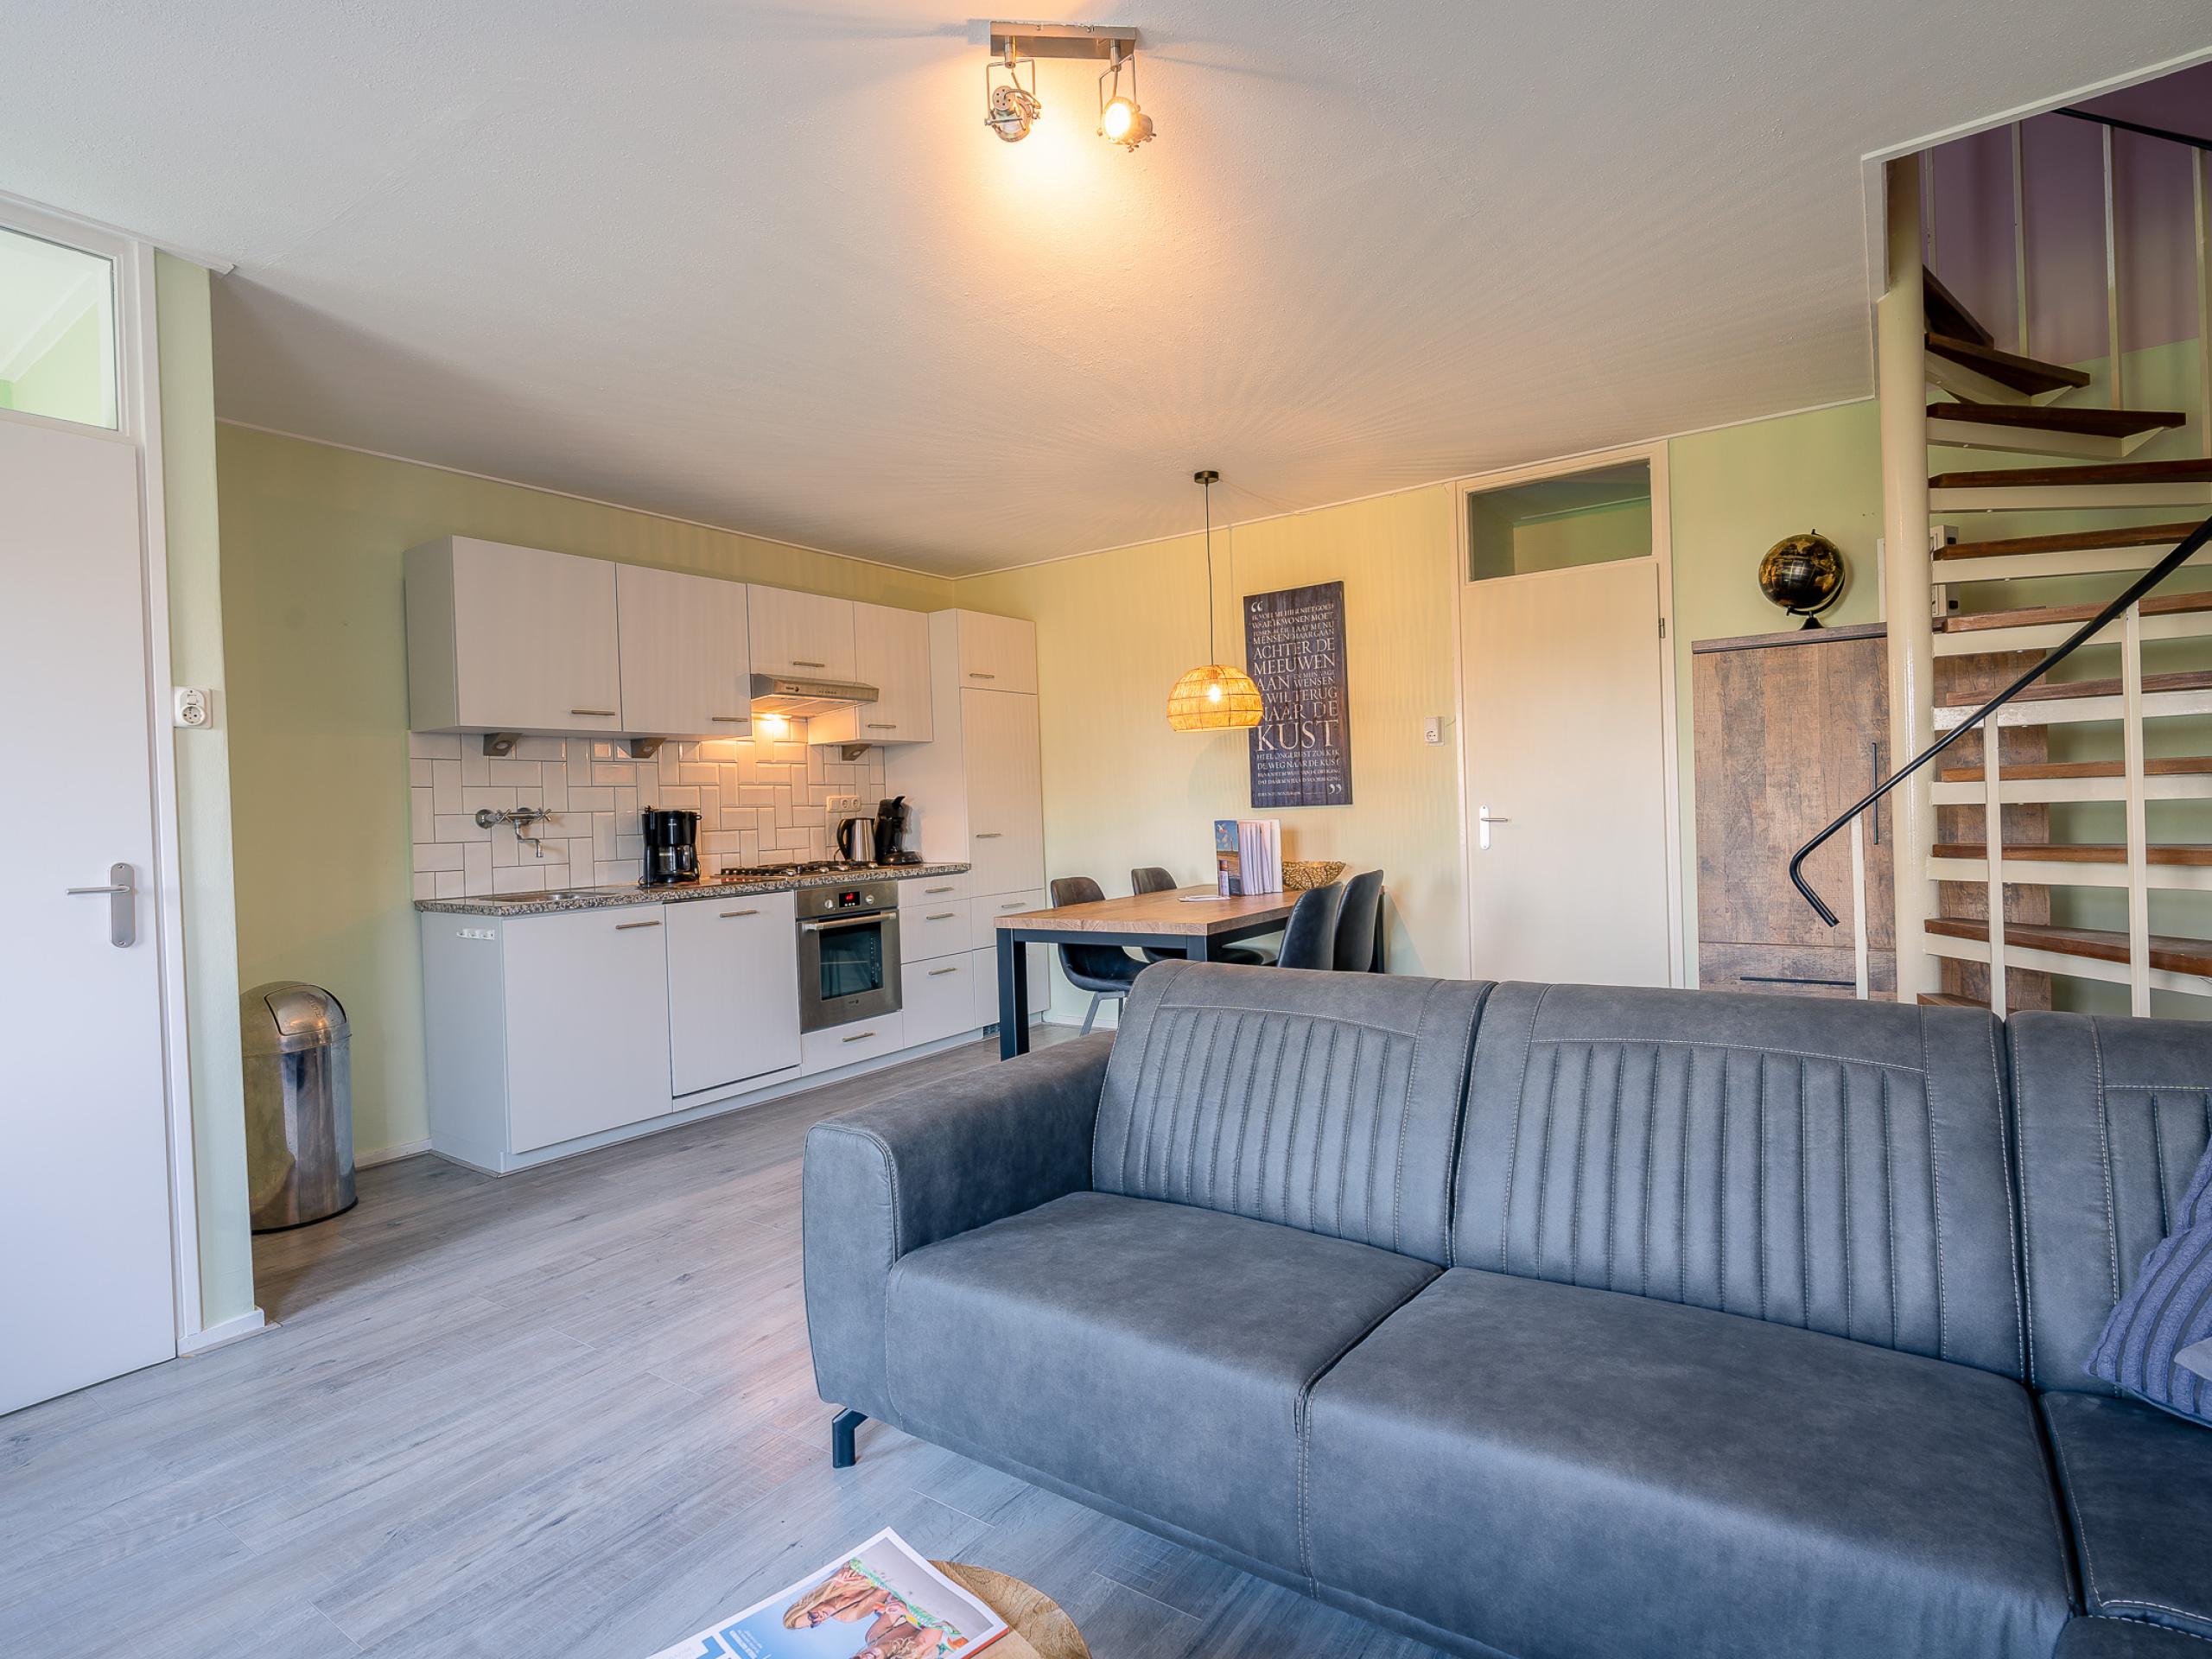 Comfortable apartment near nature reserves on the edge of De Koog